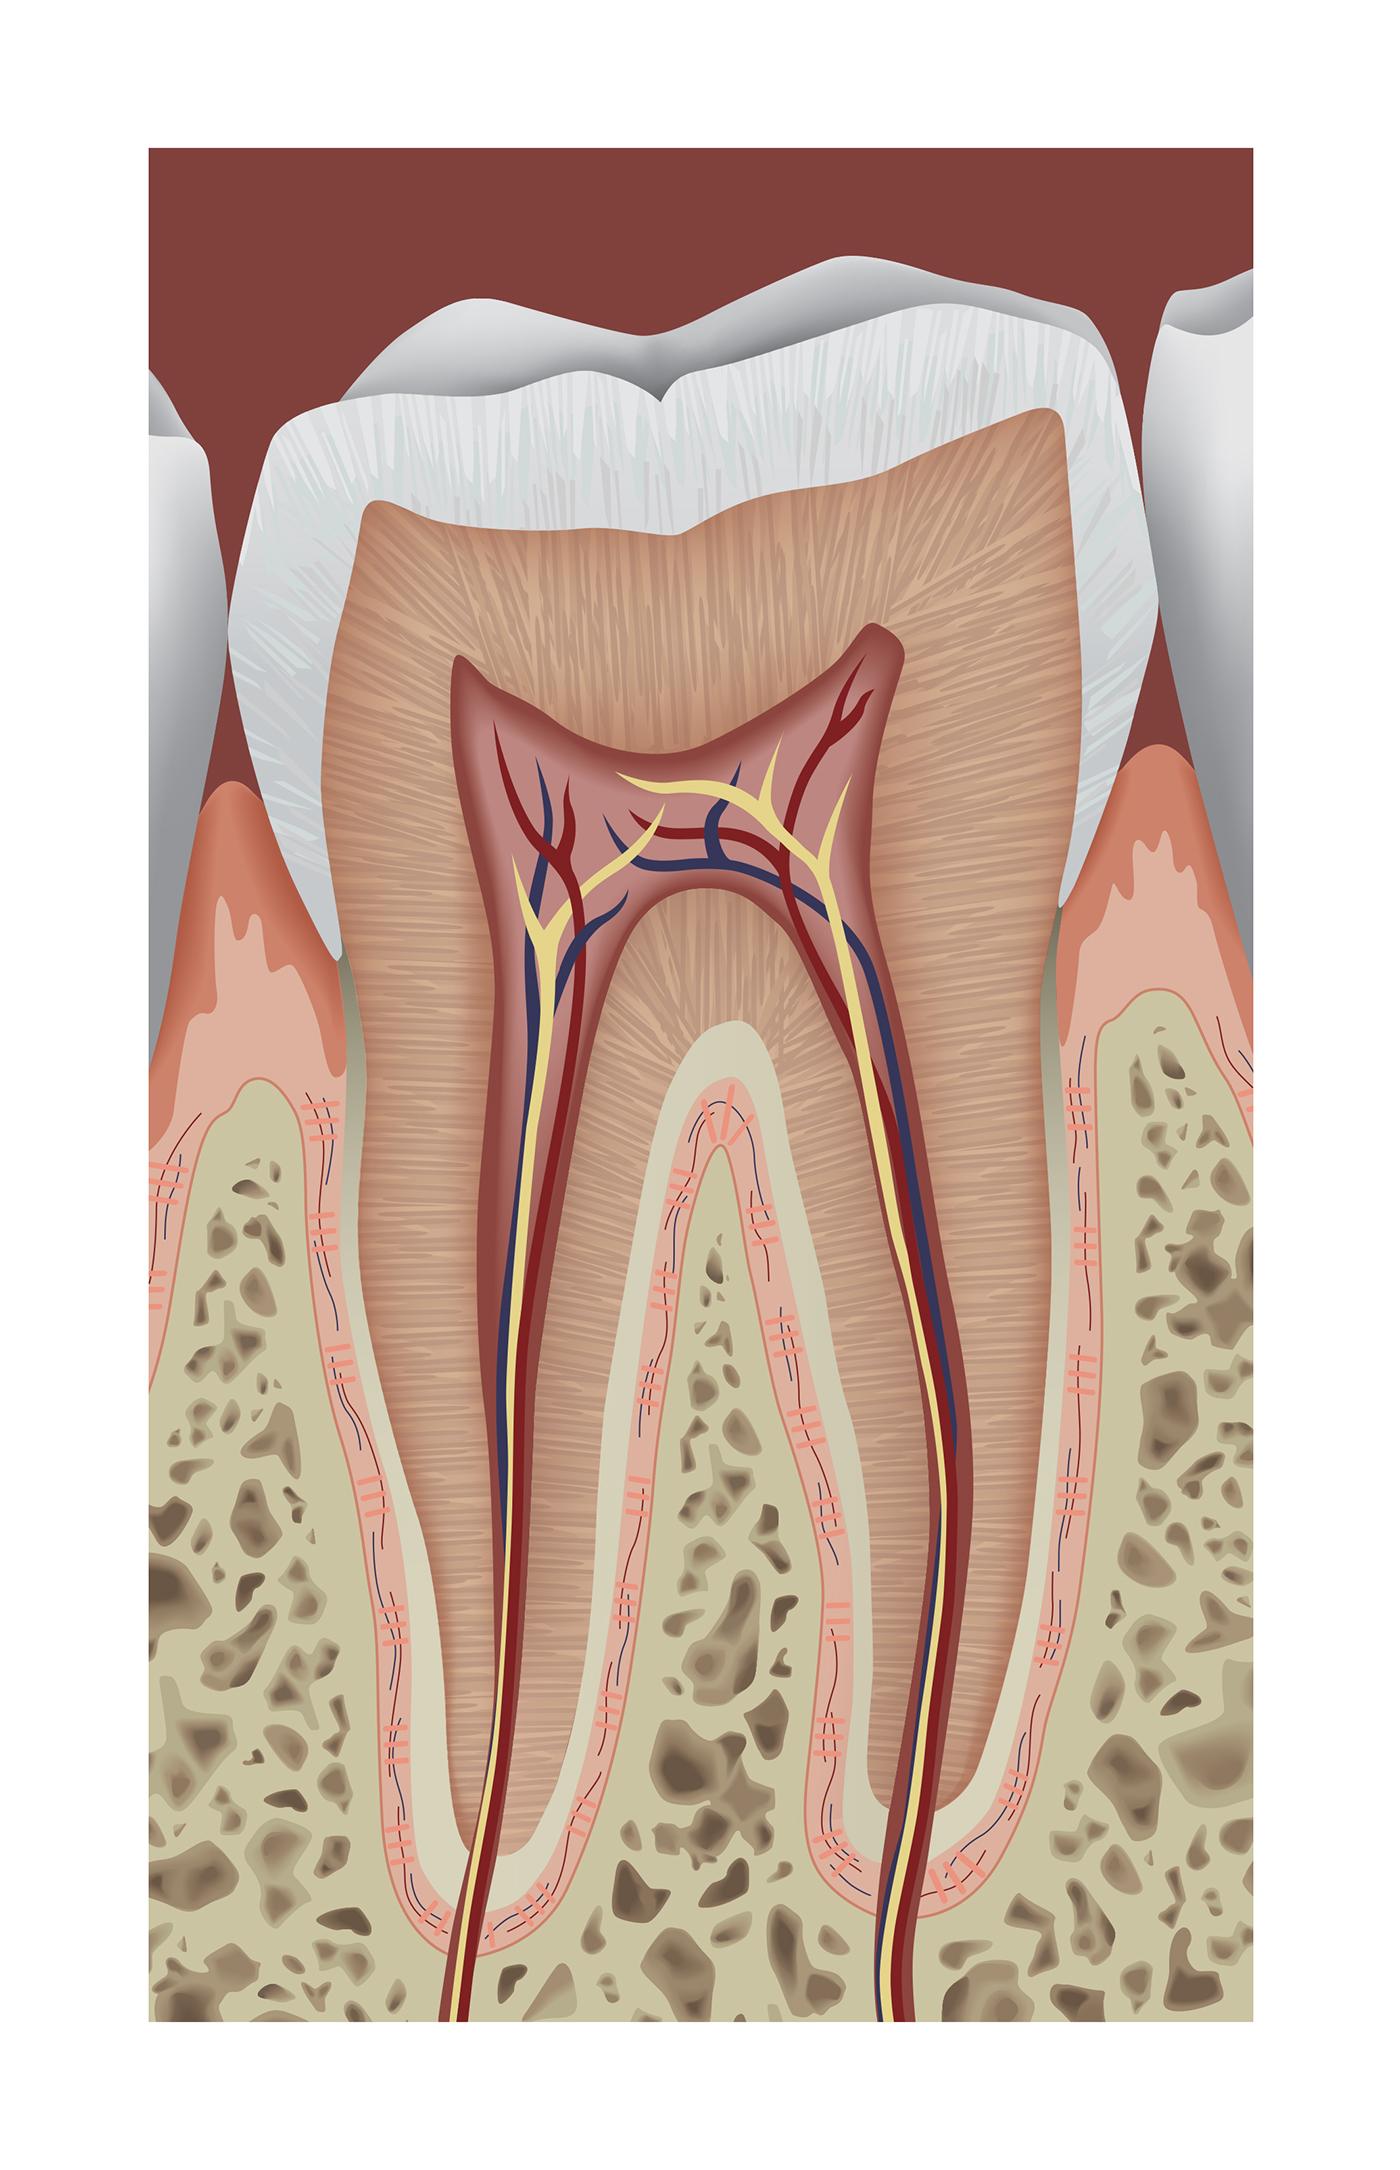 Tooth Anatomy Poster on RIT Portfolios